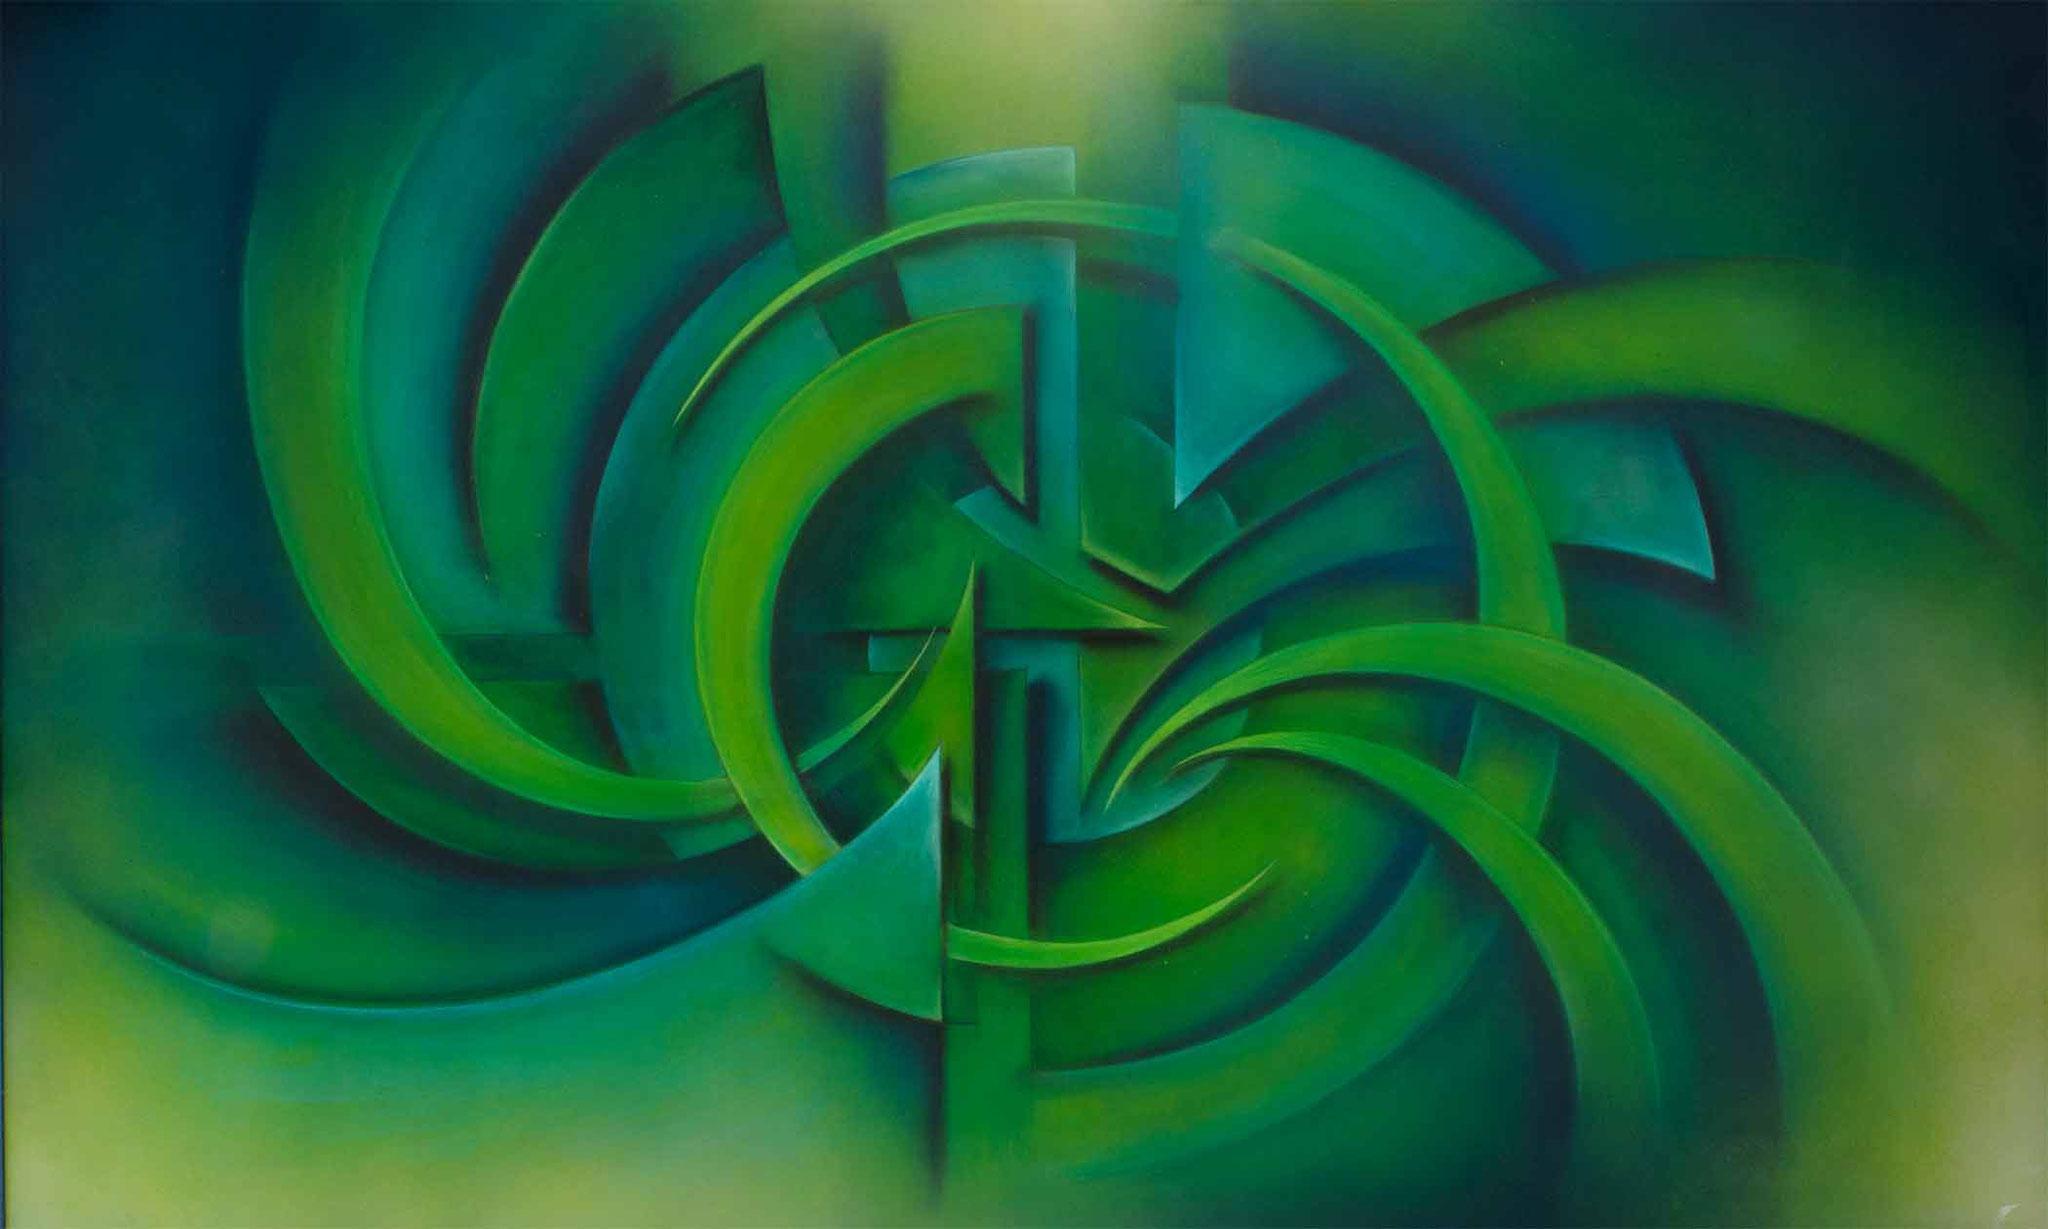 konstruktivistische Gemälde Komposition in Grüntönen